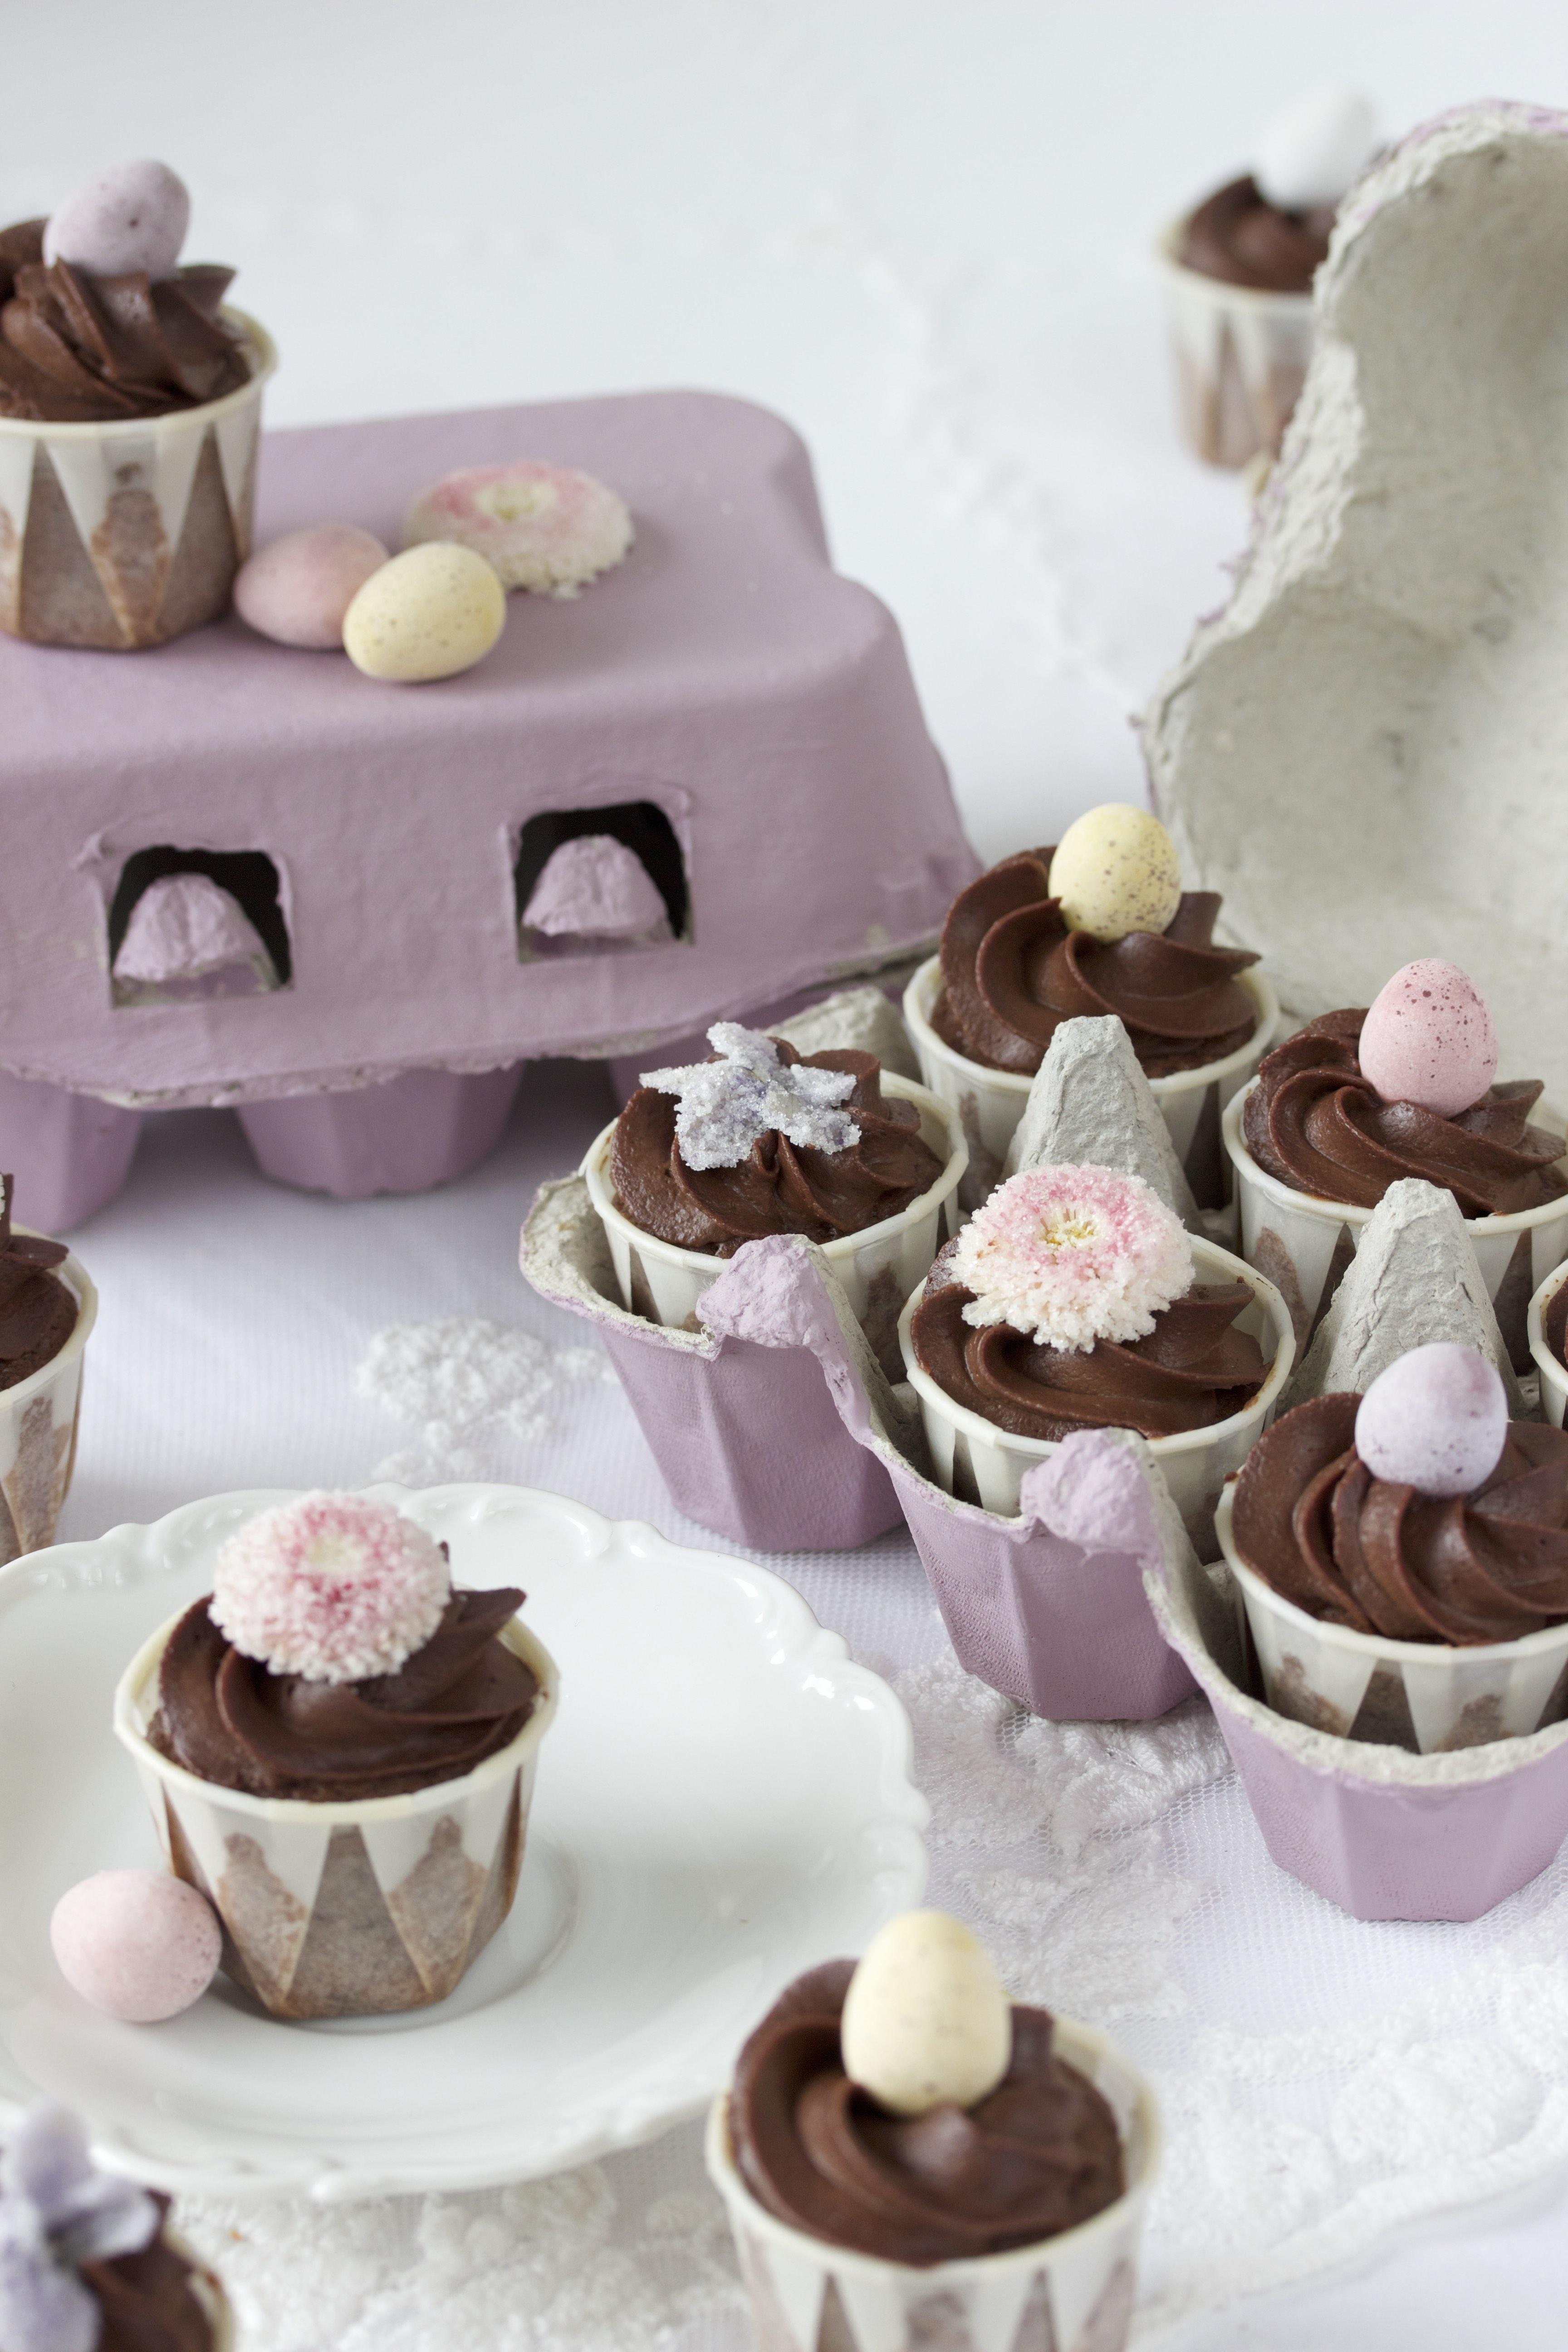 Rezept für Ostern: Schokoladen Mini Cupcakes zum Verschenken Ostercupcakes backen #cupcakes #ostern #backen Geschenke aus der Küche  #easter | Emma´s Lieblingsstücke